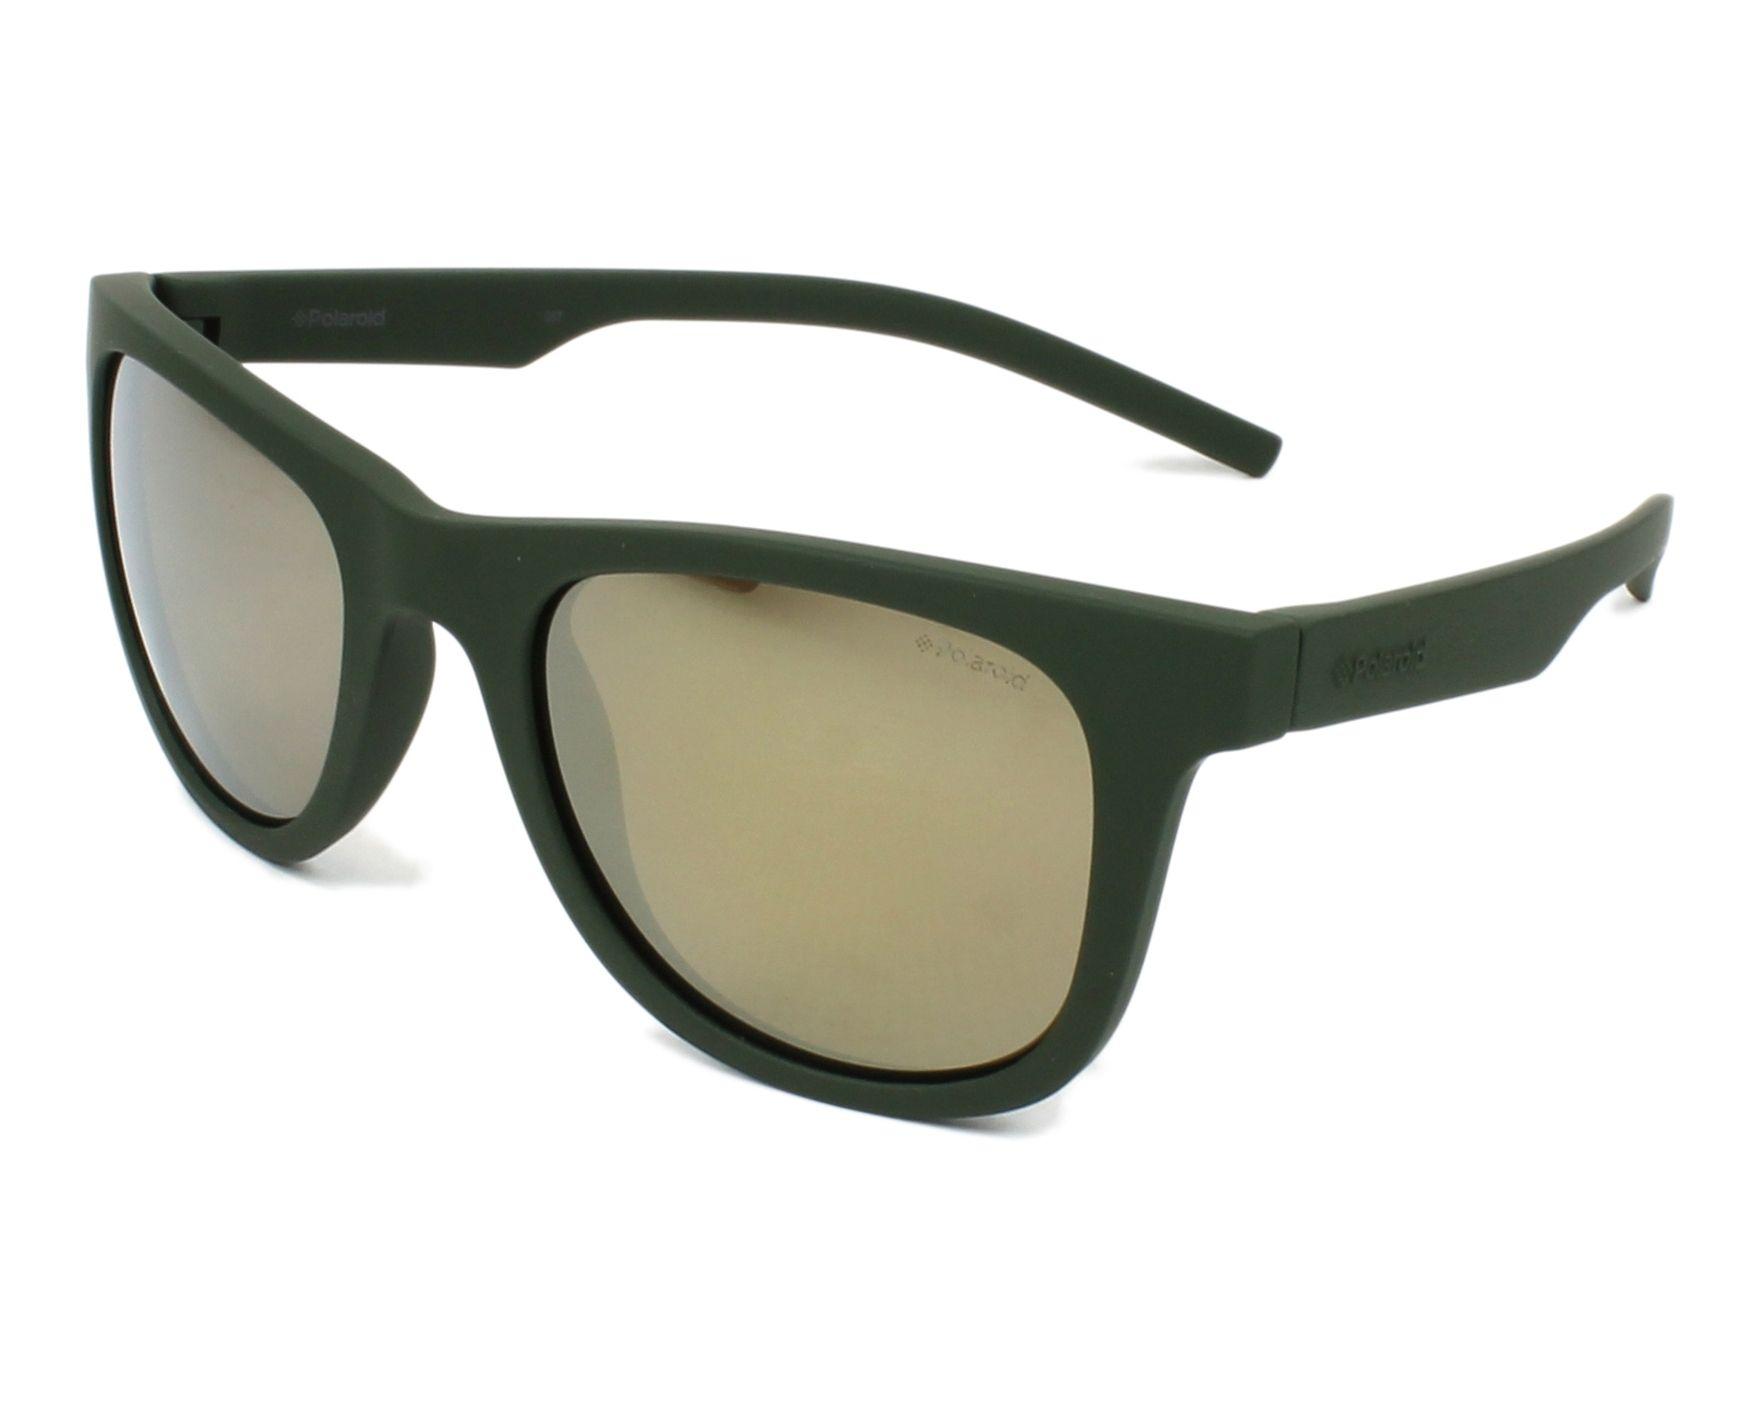 a16660698f5 thumbnail Sunglasses Polaroid PLD-7020-S 1ED LM - Green profile view